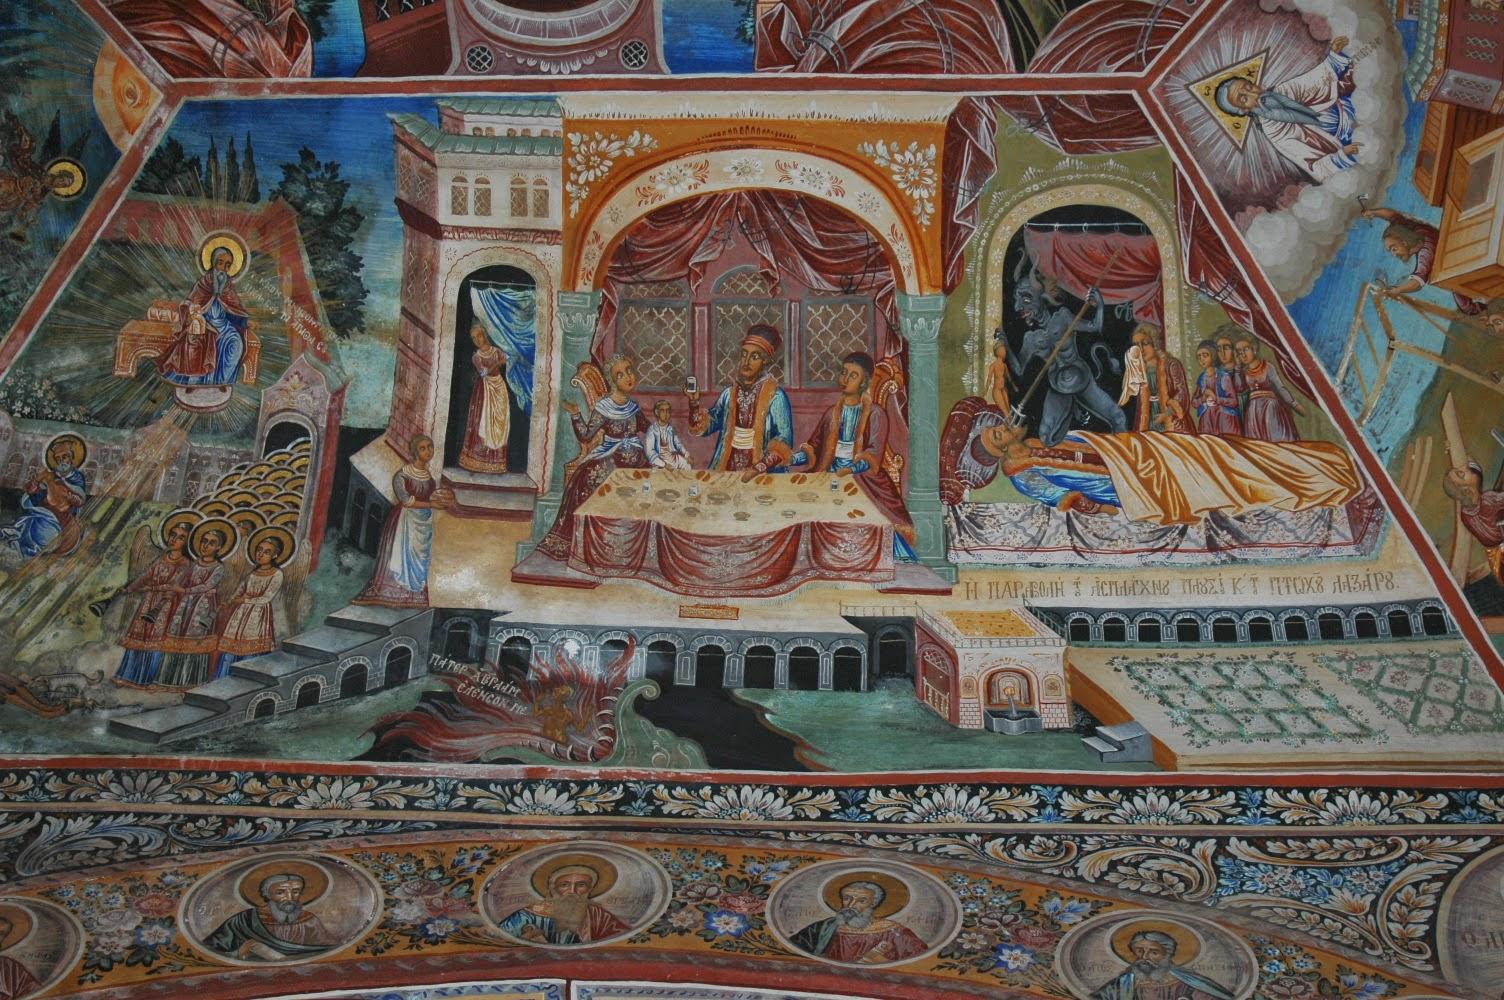 H παραβολή του άσπλαχνου πλουσίου και του φτωχού Λαζάρου - τοιχογραφία στον Νάρθηκα της Ι.Μ.Μεγίστης Λαύρας.